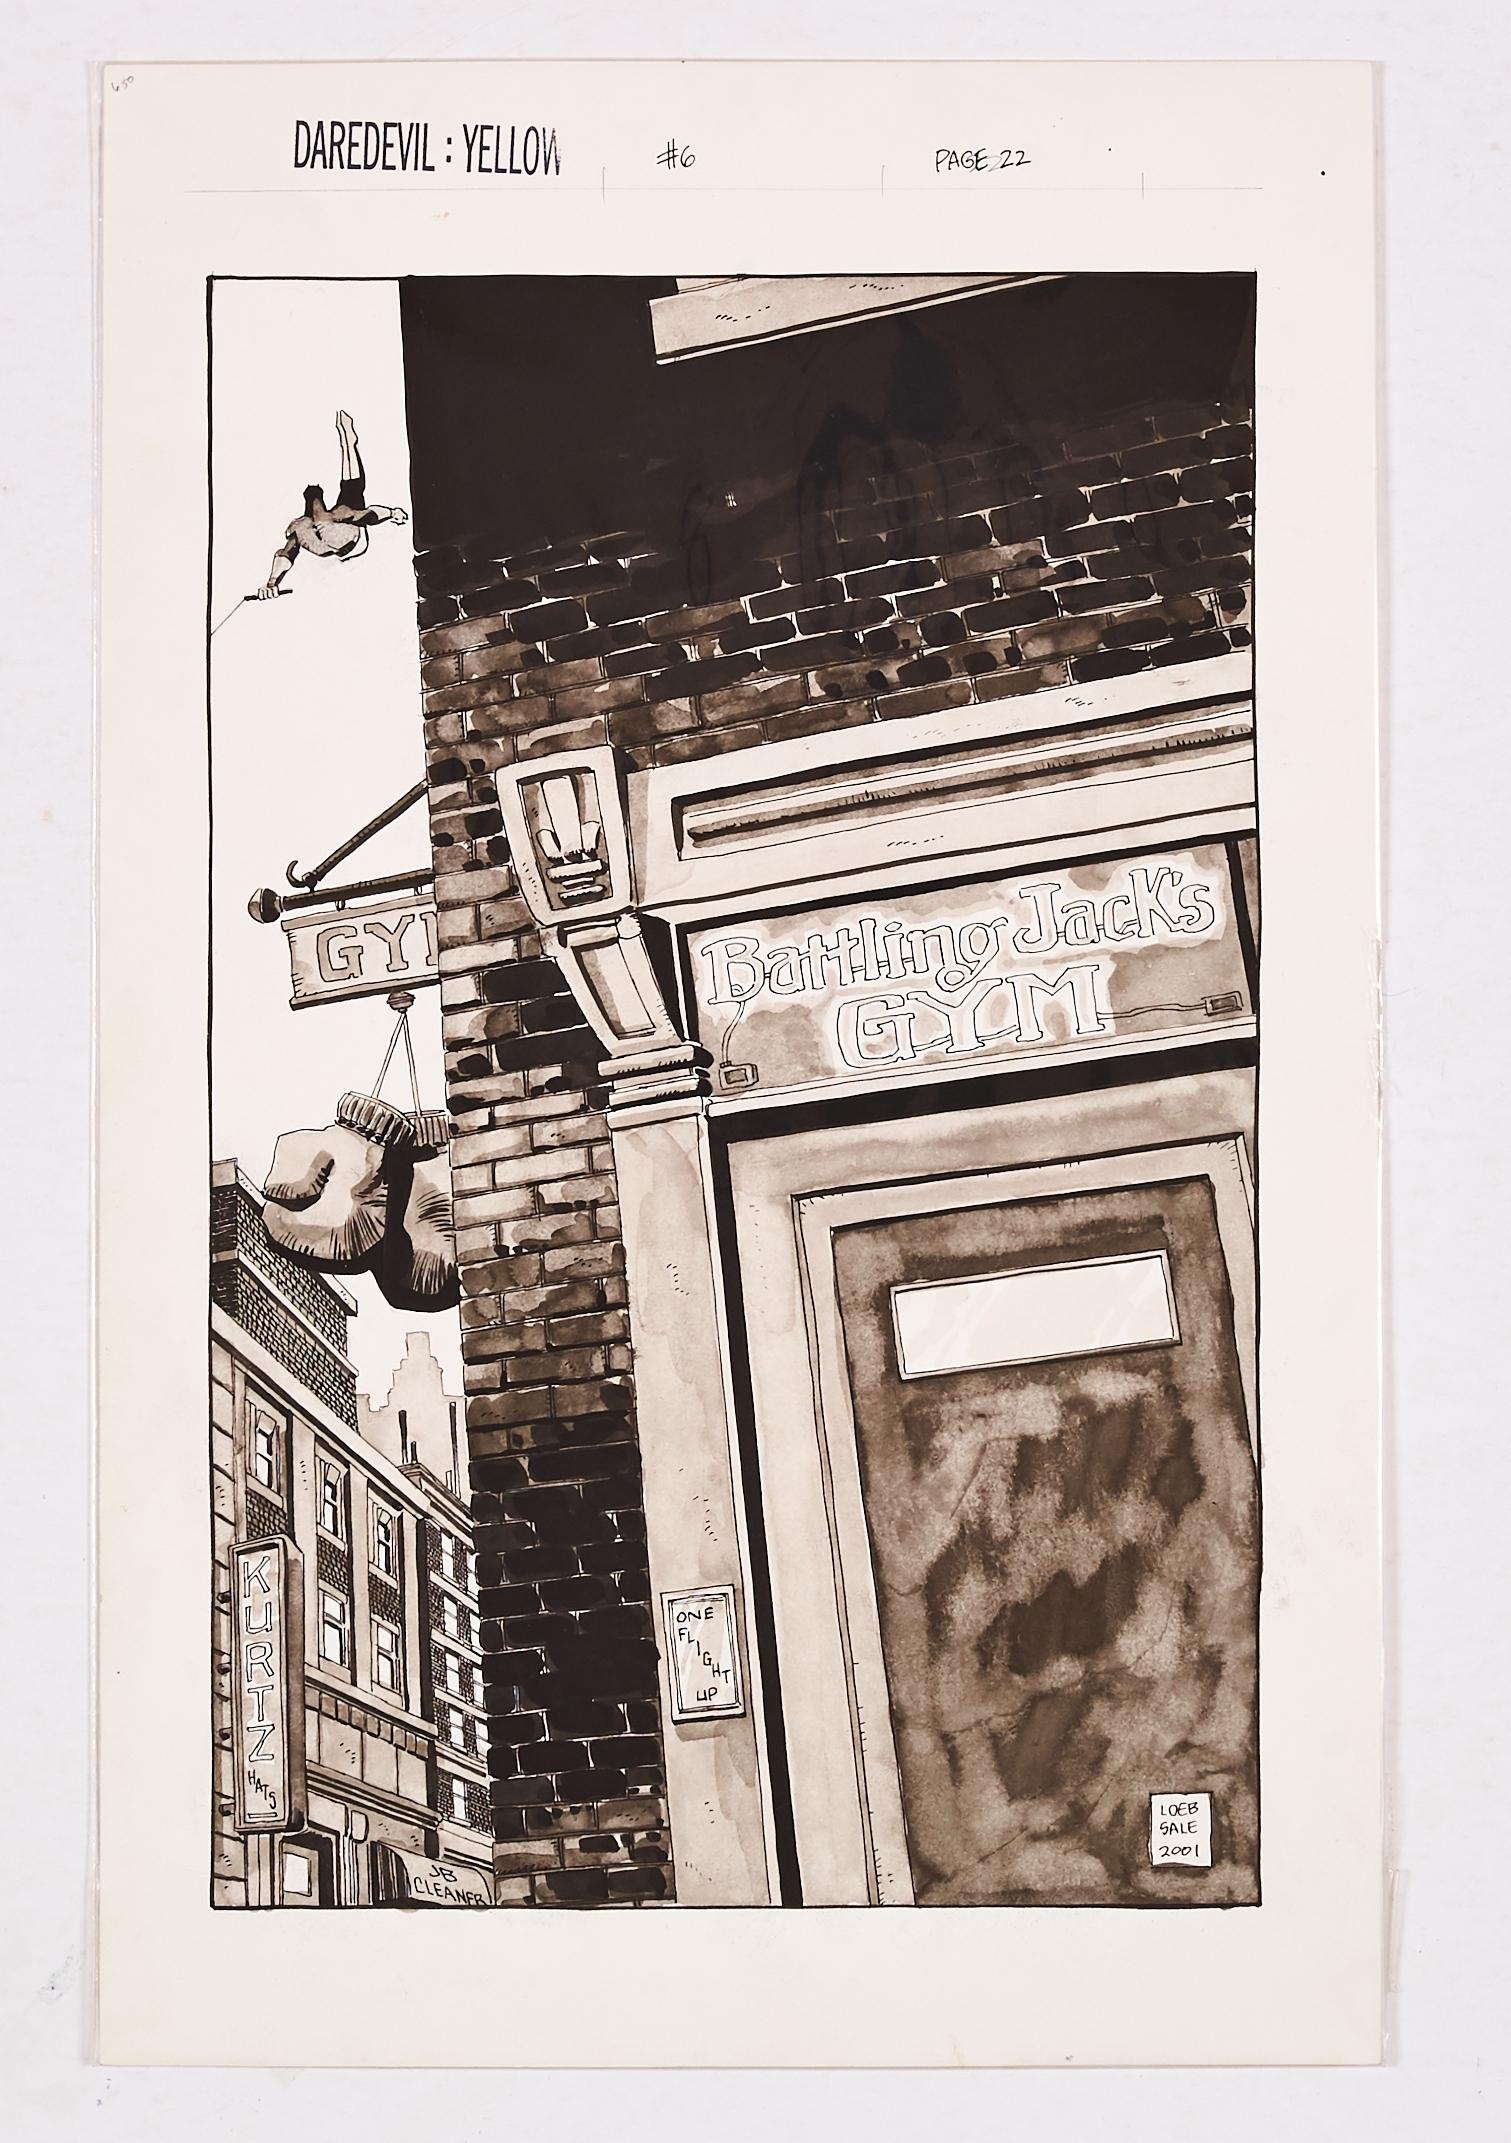 Lot 262 - Daredevil: Yellow # 6 pg 22 original artwork by Tim Sale (2001). After Battling Jack Murdoch's